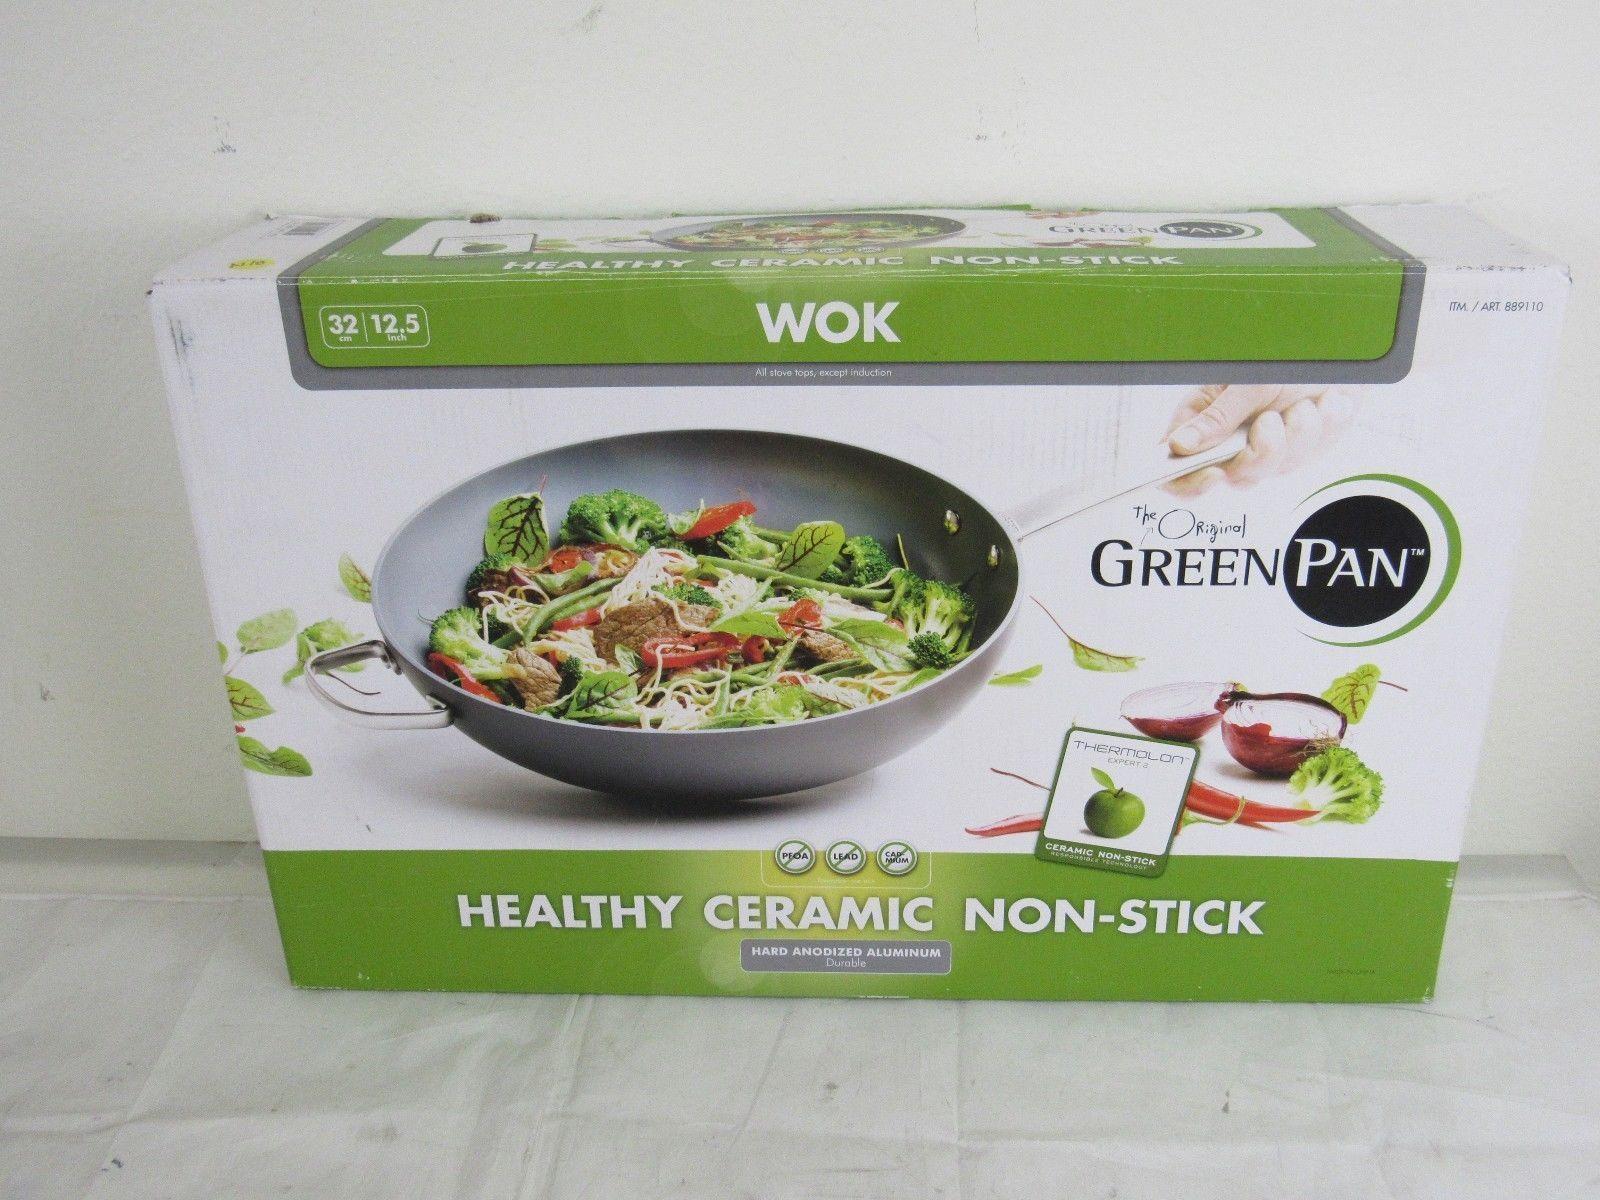 The Original Green Pan Ceramic Non-Stick Oven Safe 12.5 ...